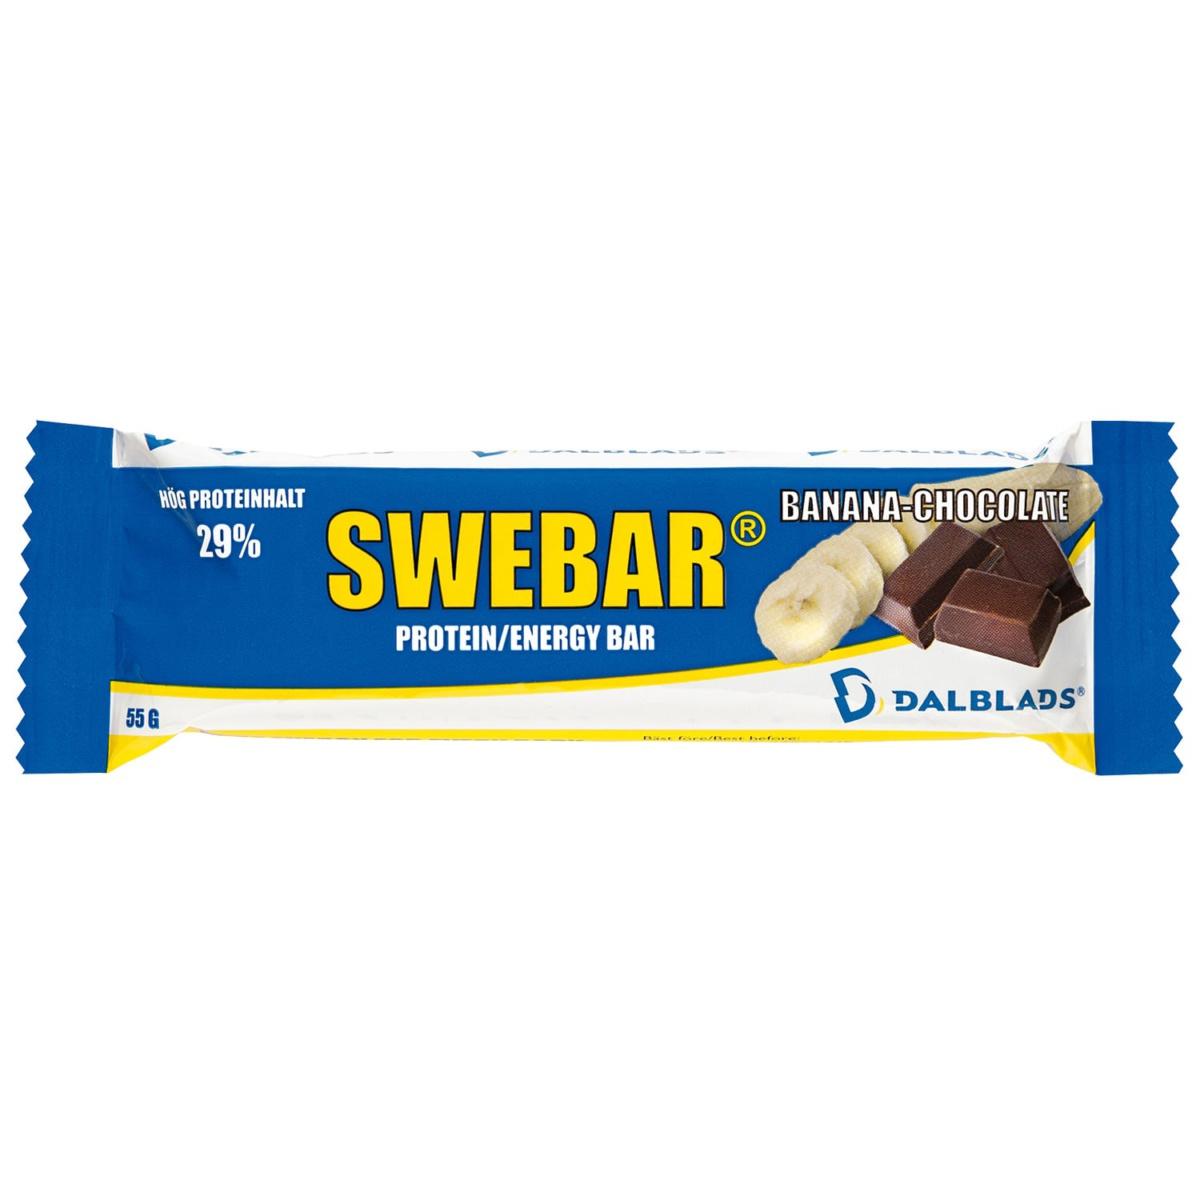 SWEBAR-banana-chocolate.jpg